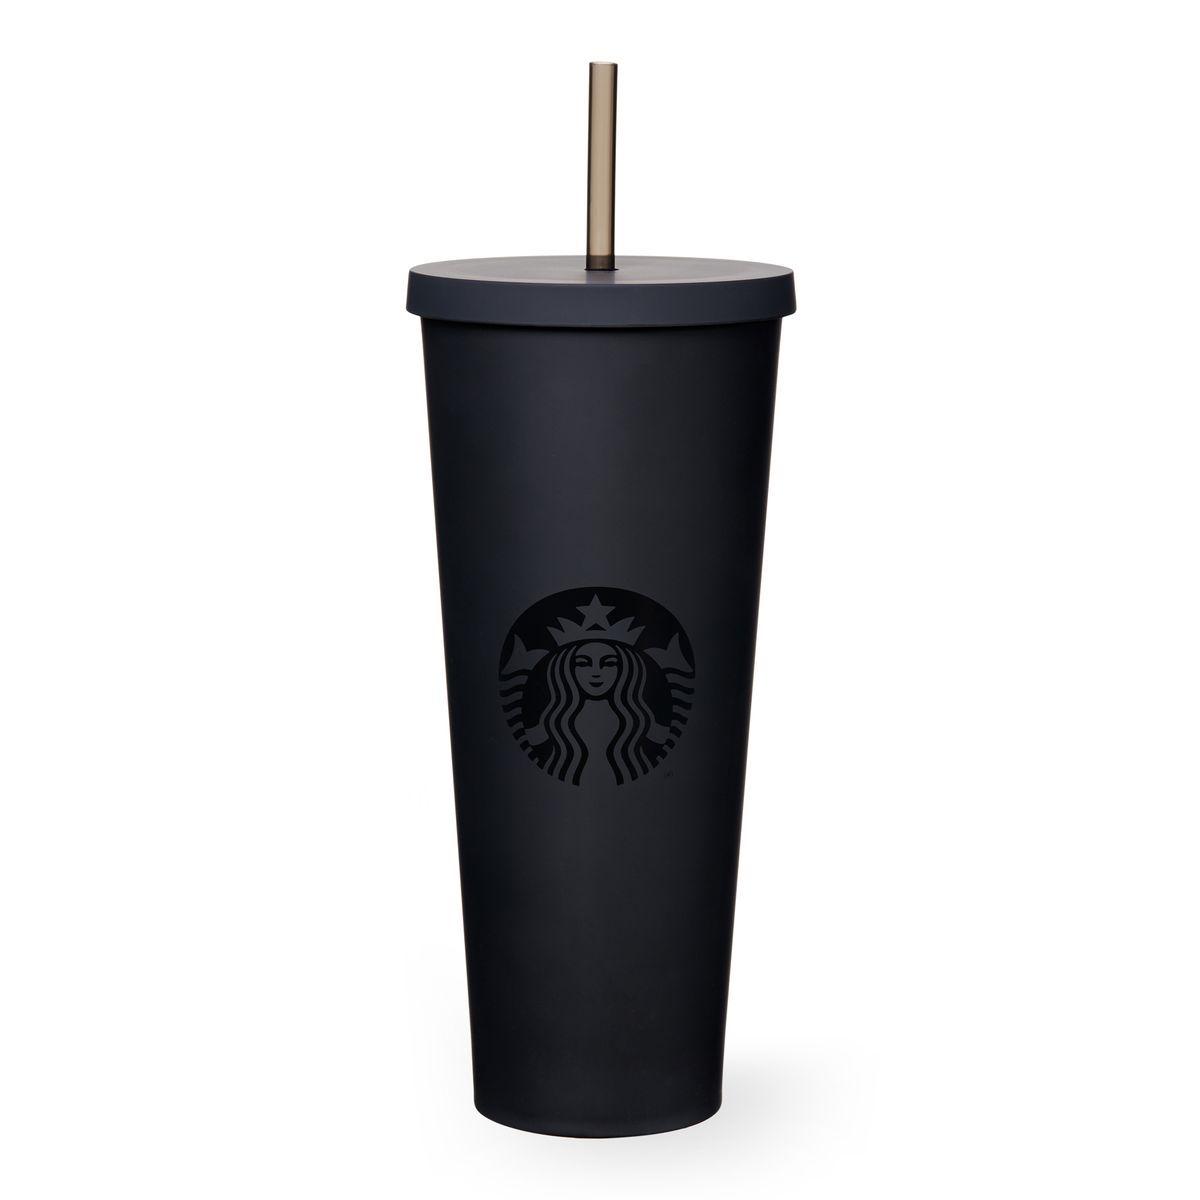 A Sturdy Venti Size Plastic Cold Cup In Matte Black